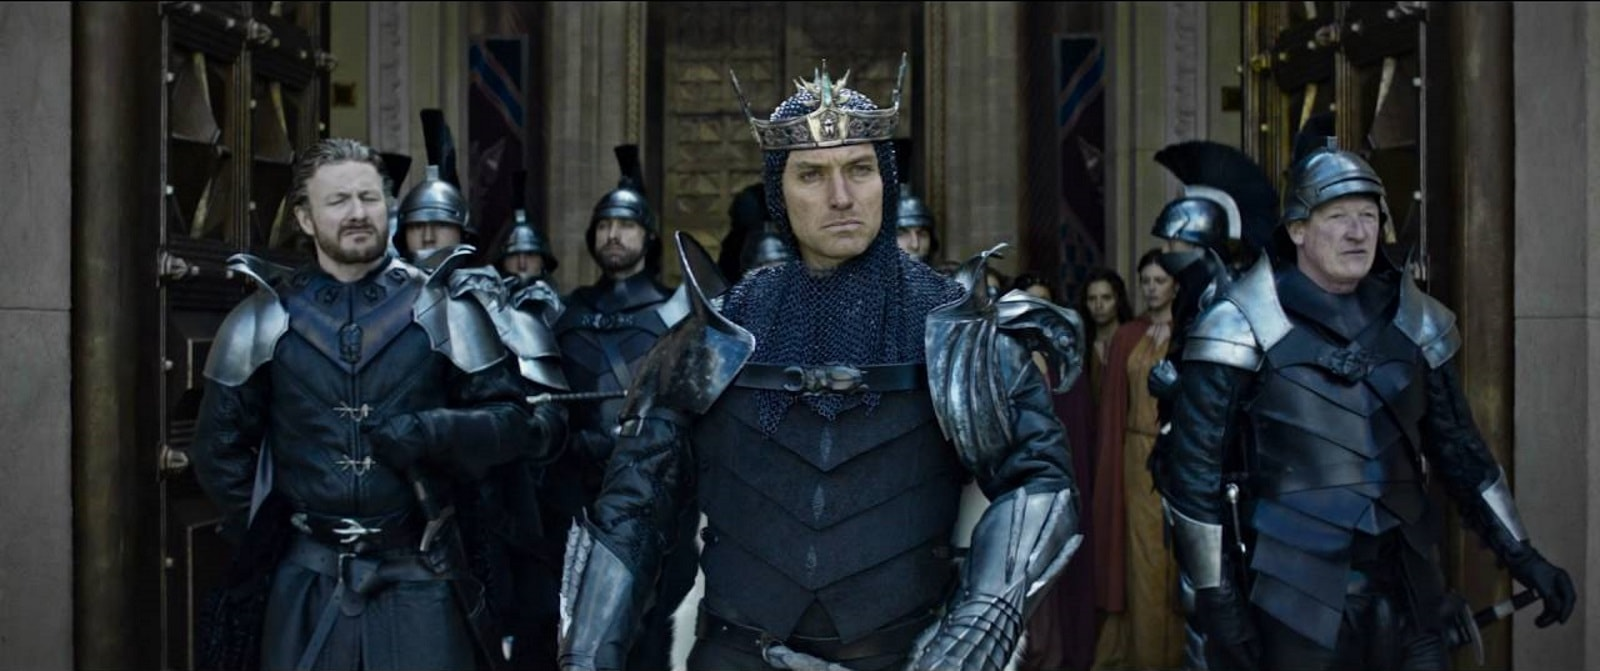 King Arthur: Legend of the Sword HD pics